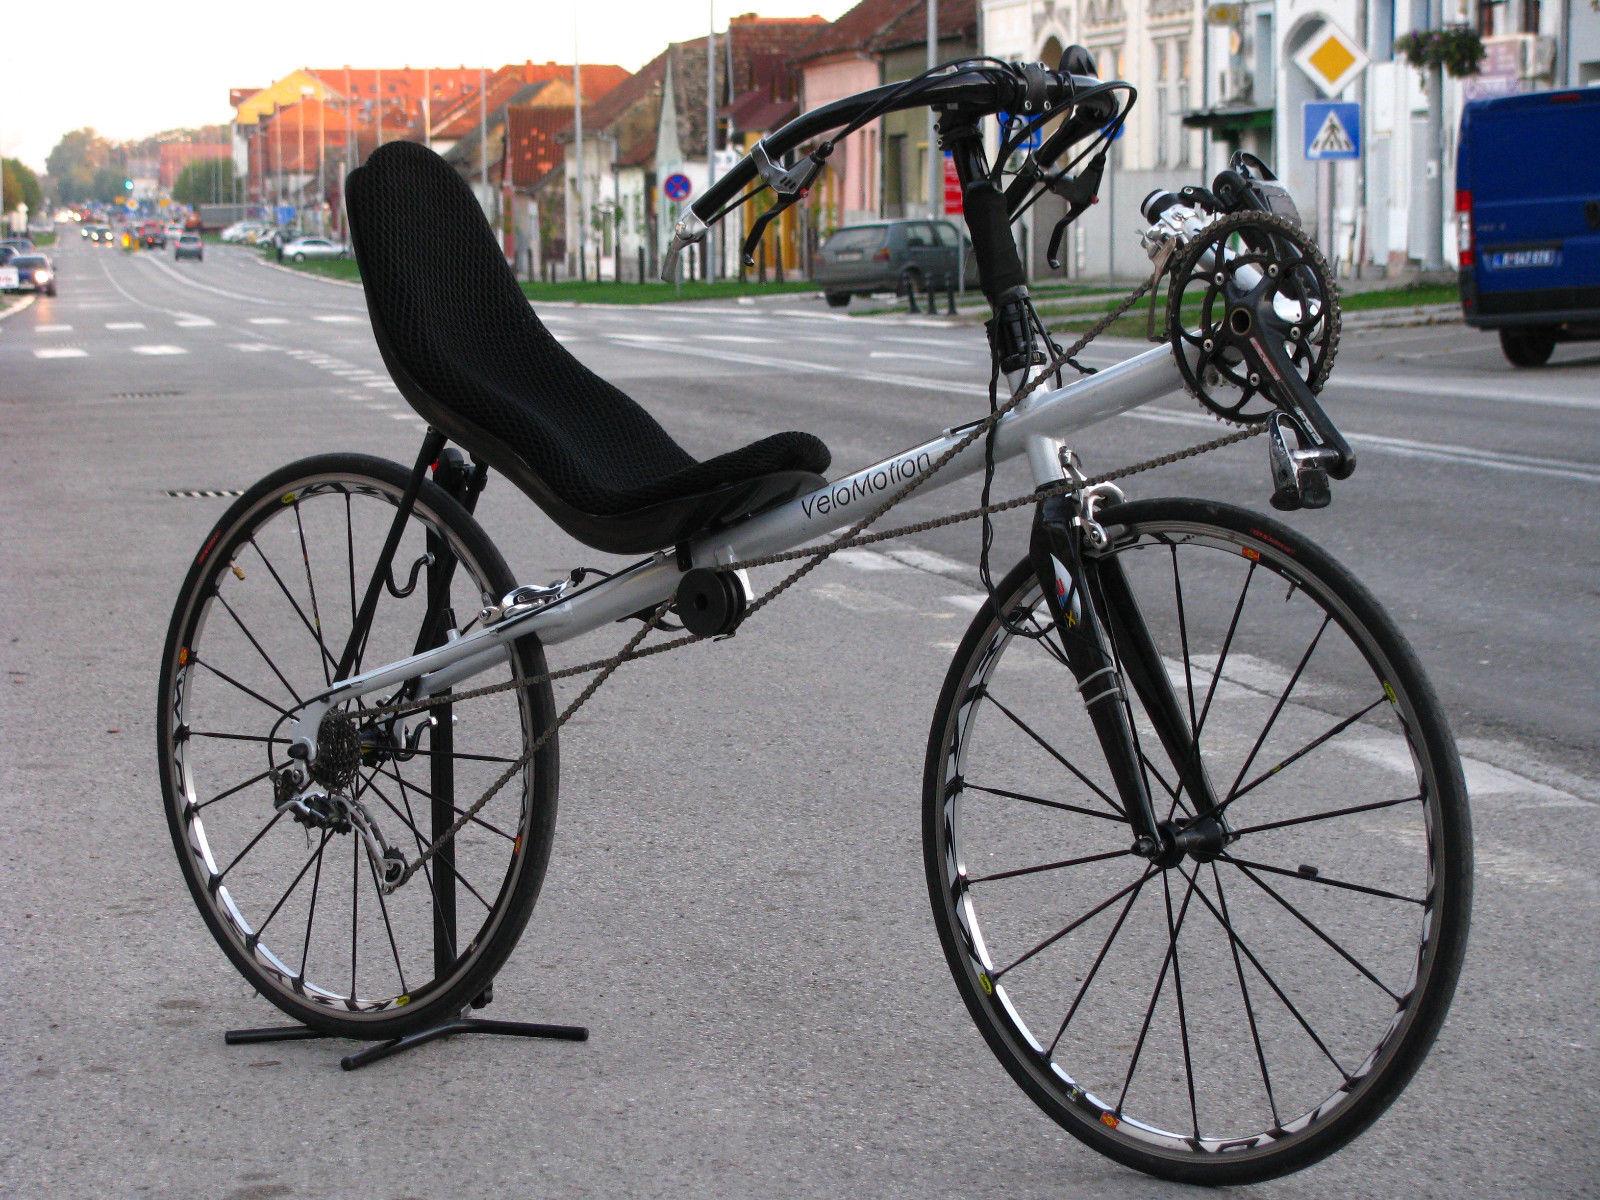 VeloMotion Scopa - brand new recumbent bicycle frame set kit  road audax gravel